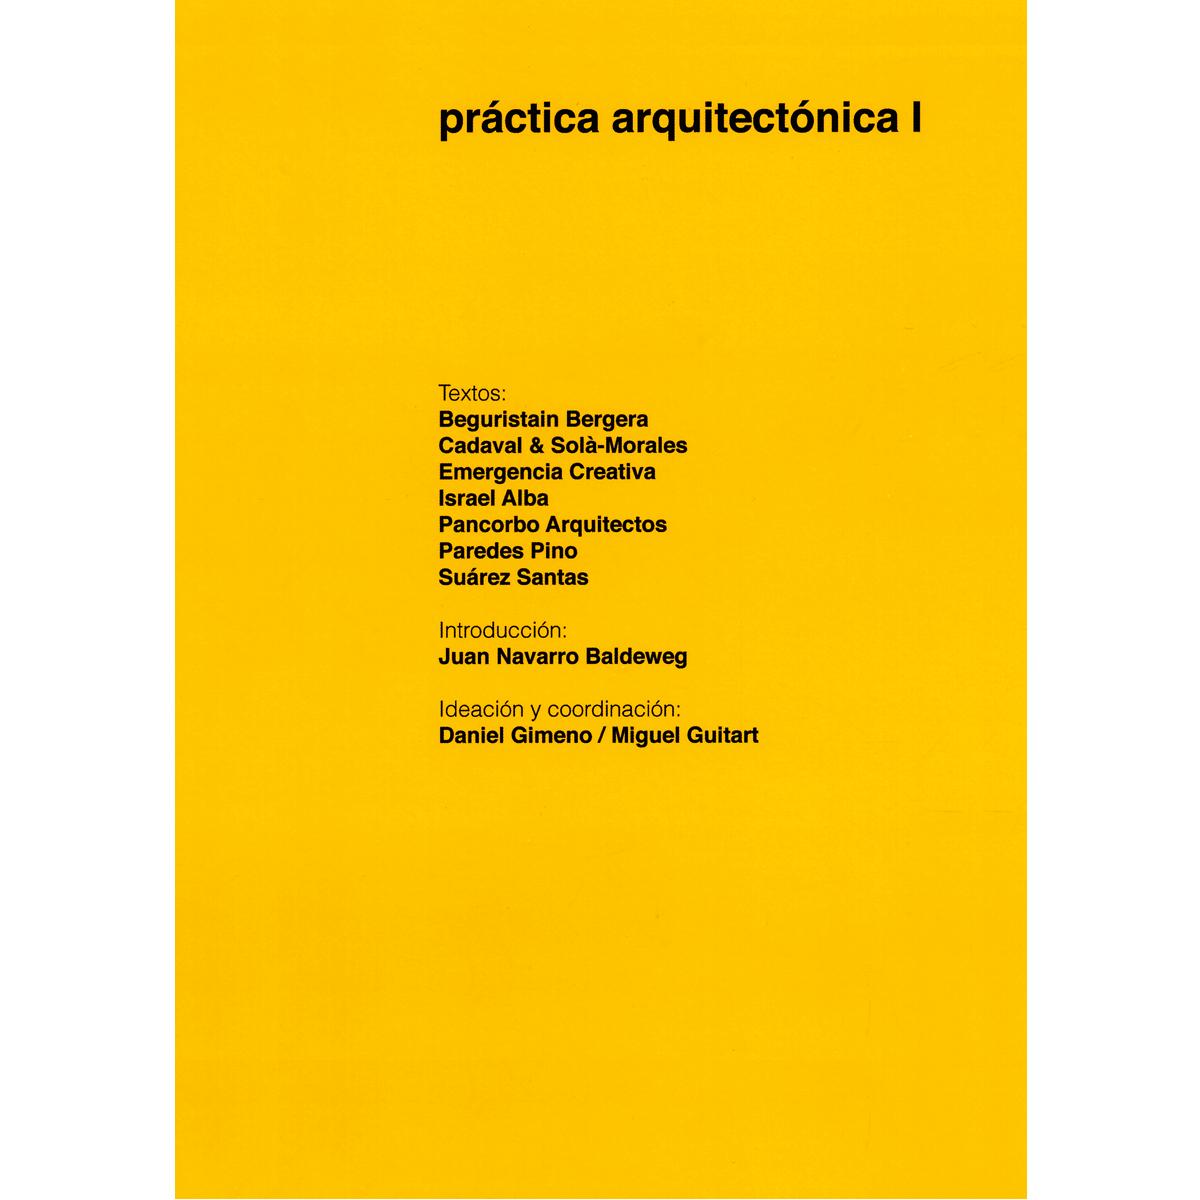 Práctica arquitectónica I